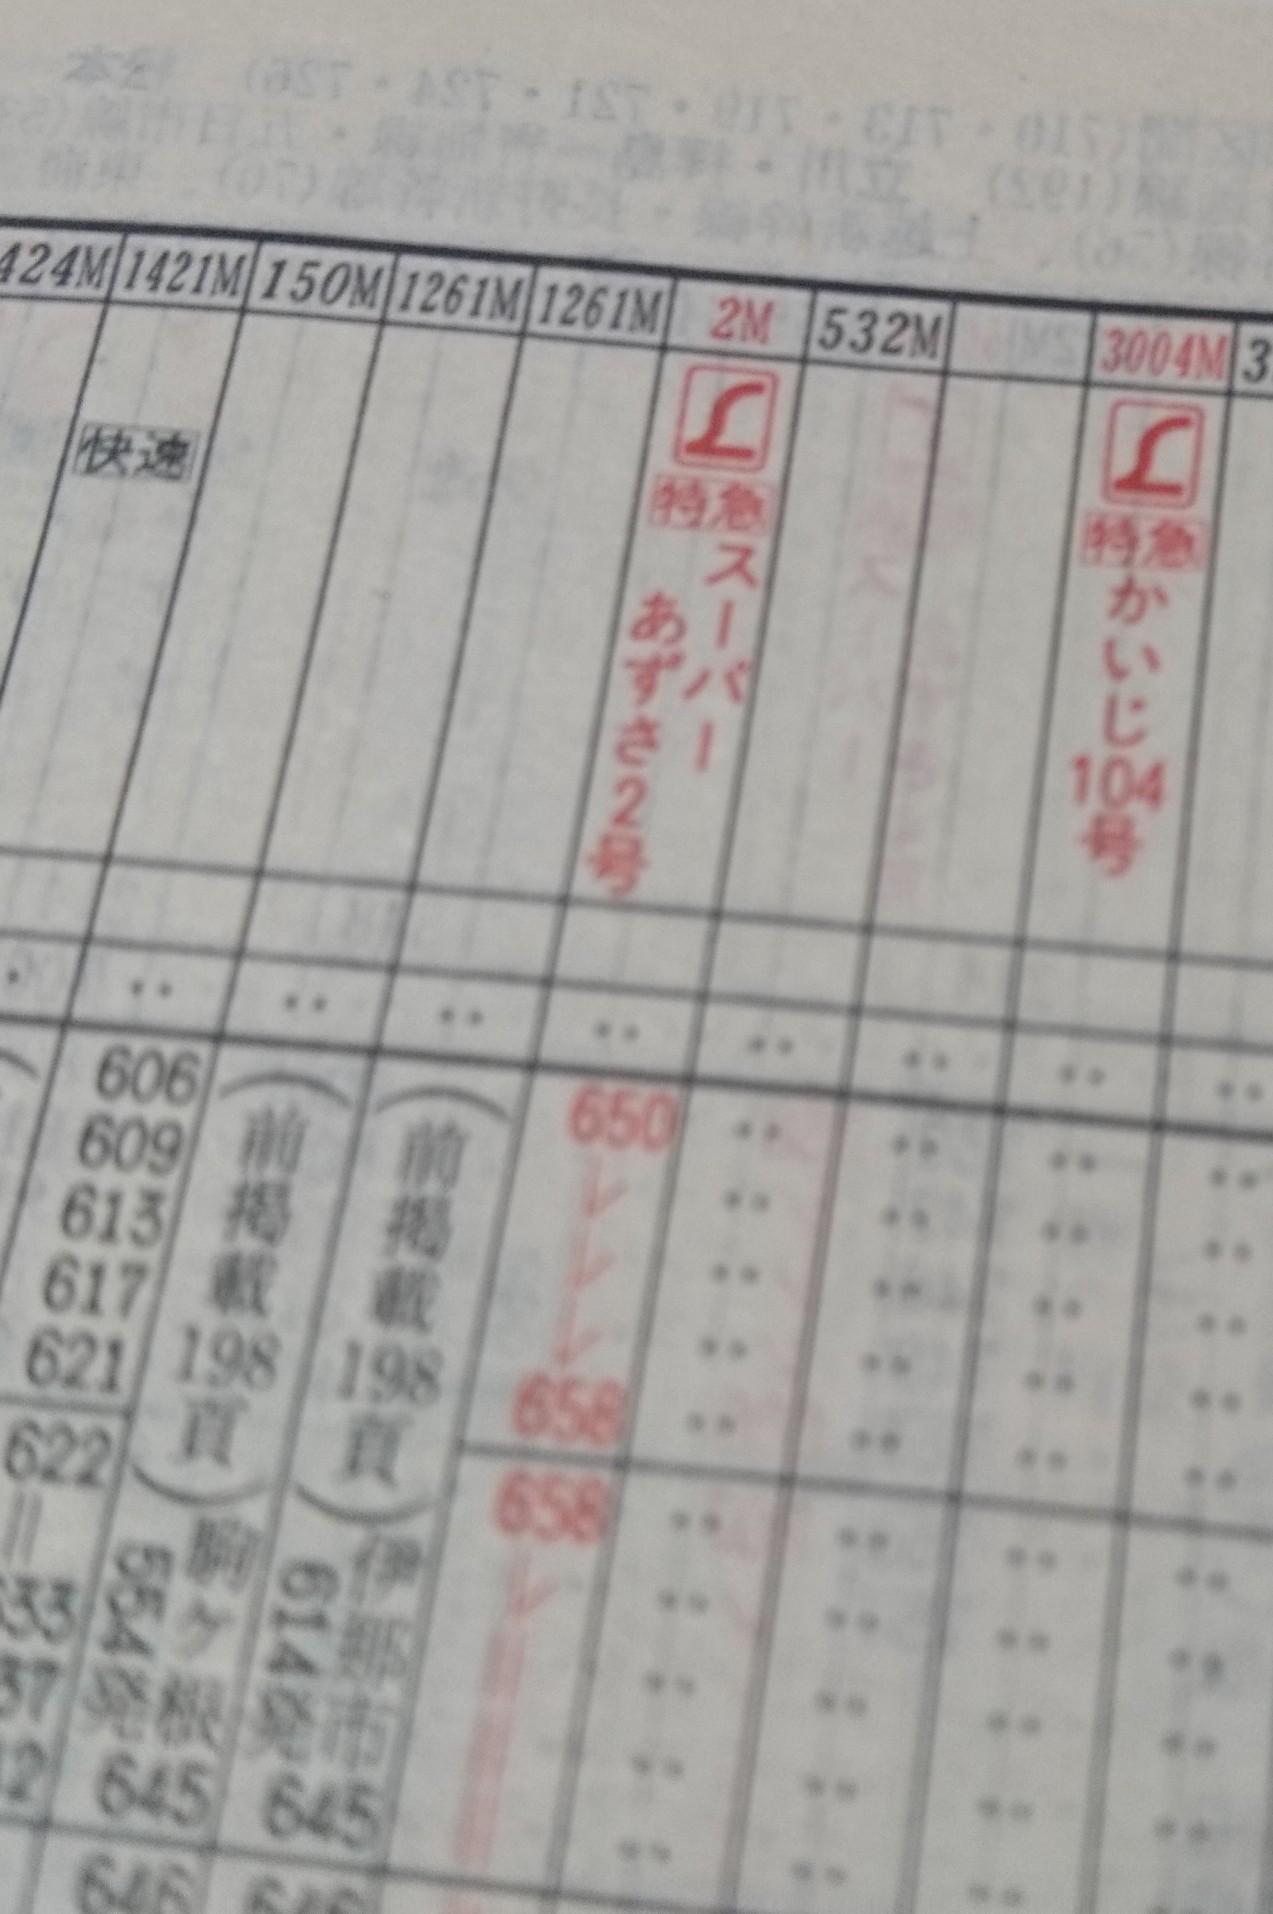 JR時刻表2002年2月号、あずさ2号復活!JR北海道旅客鉄道株式会社、発行所、交通新聞社_b0106766_19392483.jpg